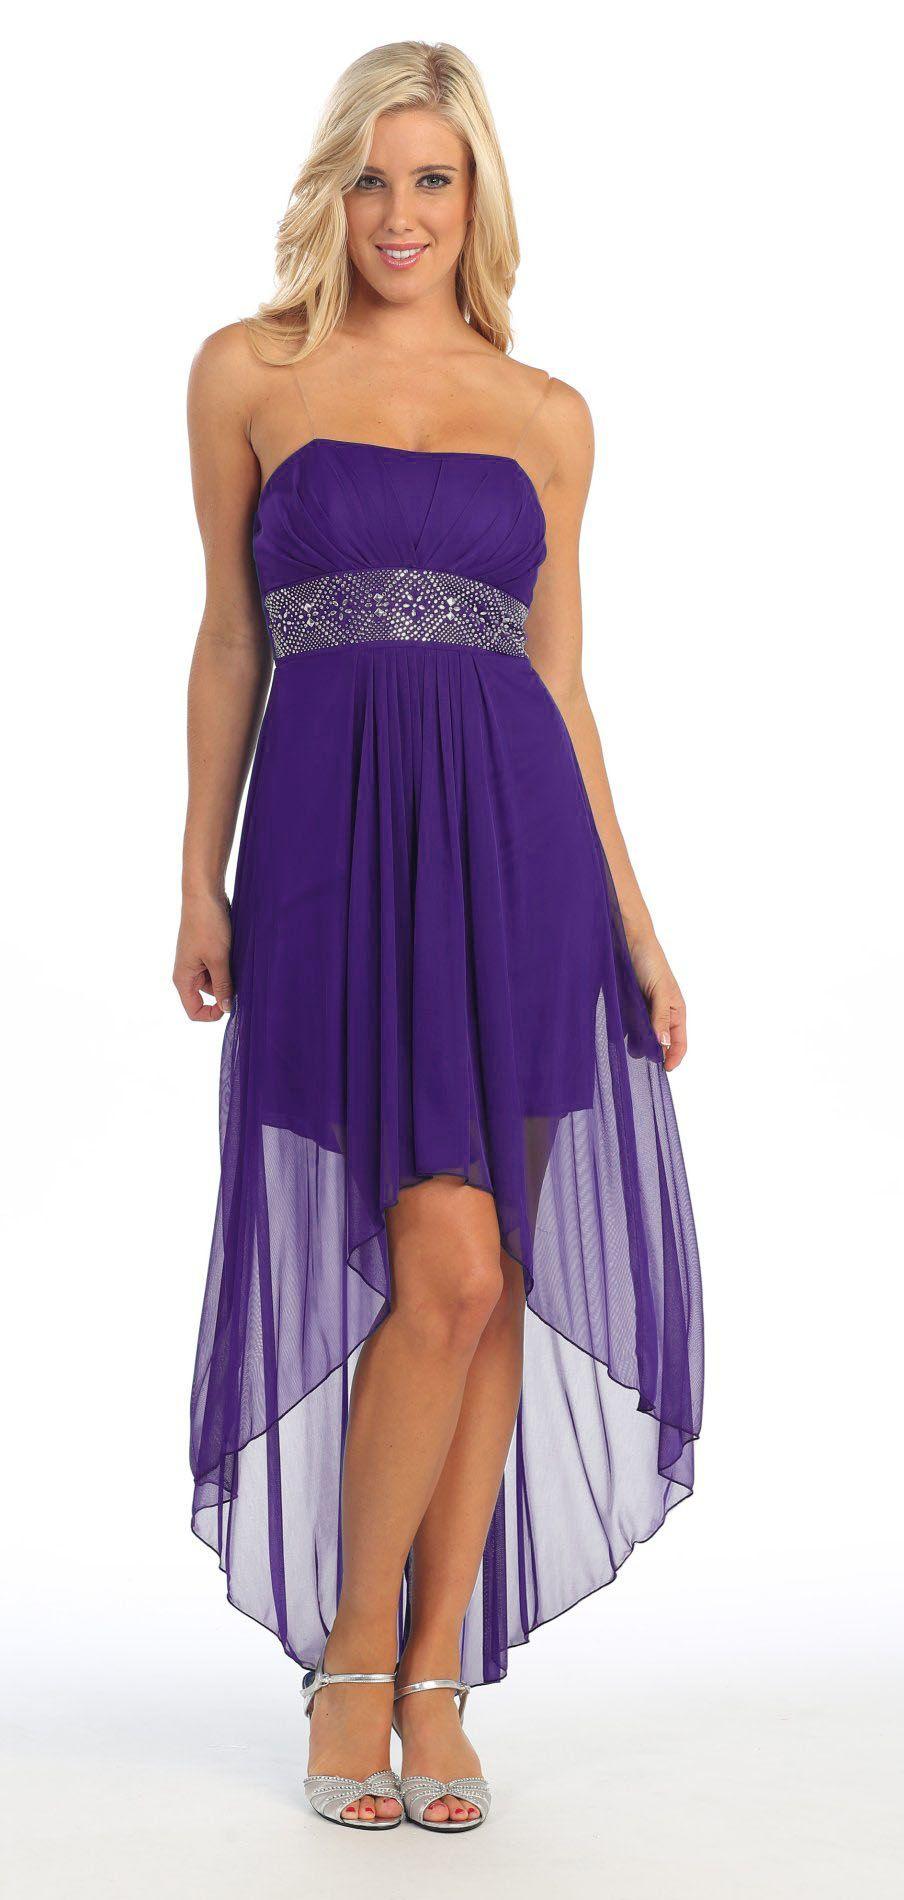 Strapless High Low Lavender Bridesmaid Dress Flowy Chiffon Empire